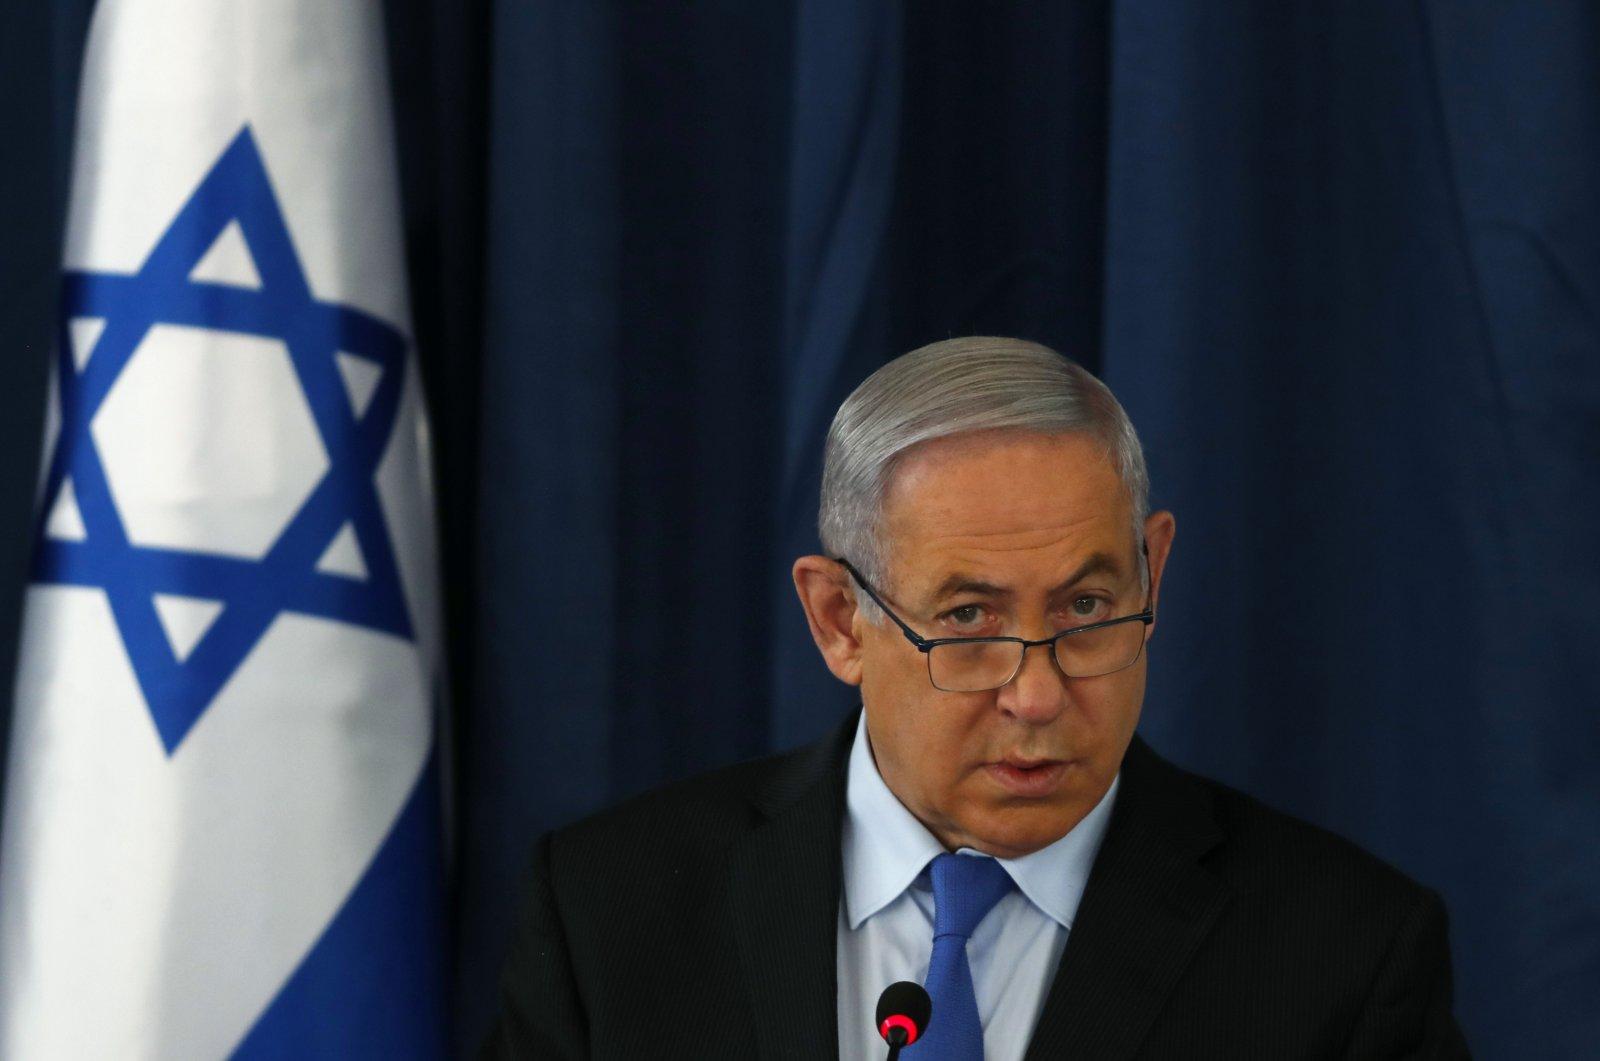 Israeli Prime Minister Benjamin Netanyahu holds the weekly cabinet meeting in Jerusalem, June 28, 2020. (AP Photo)